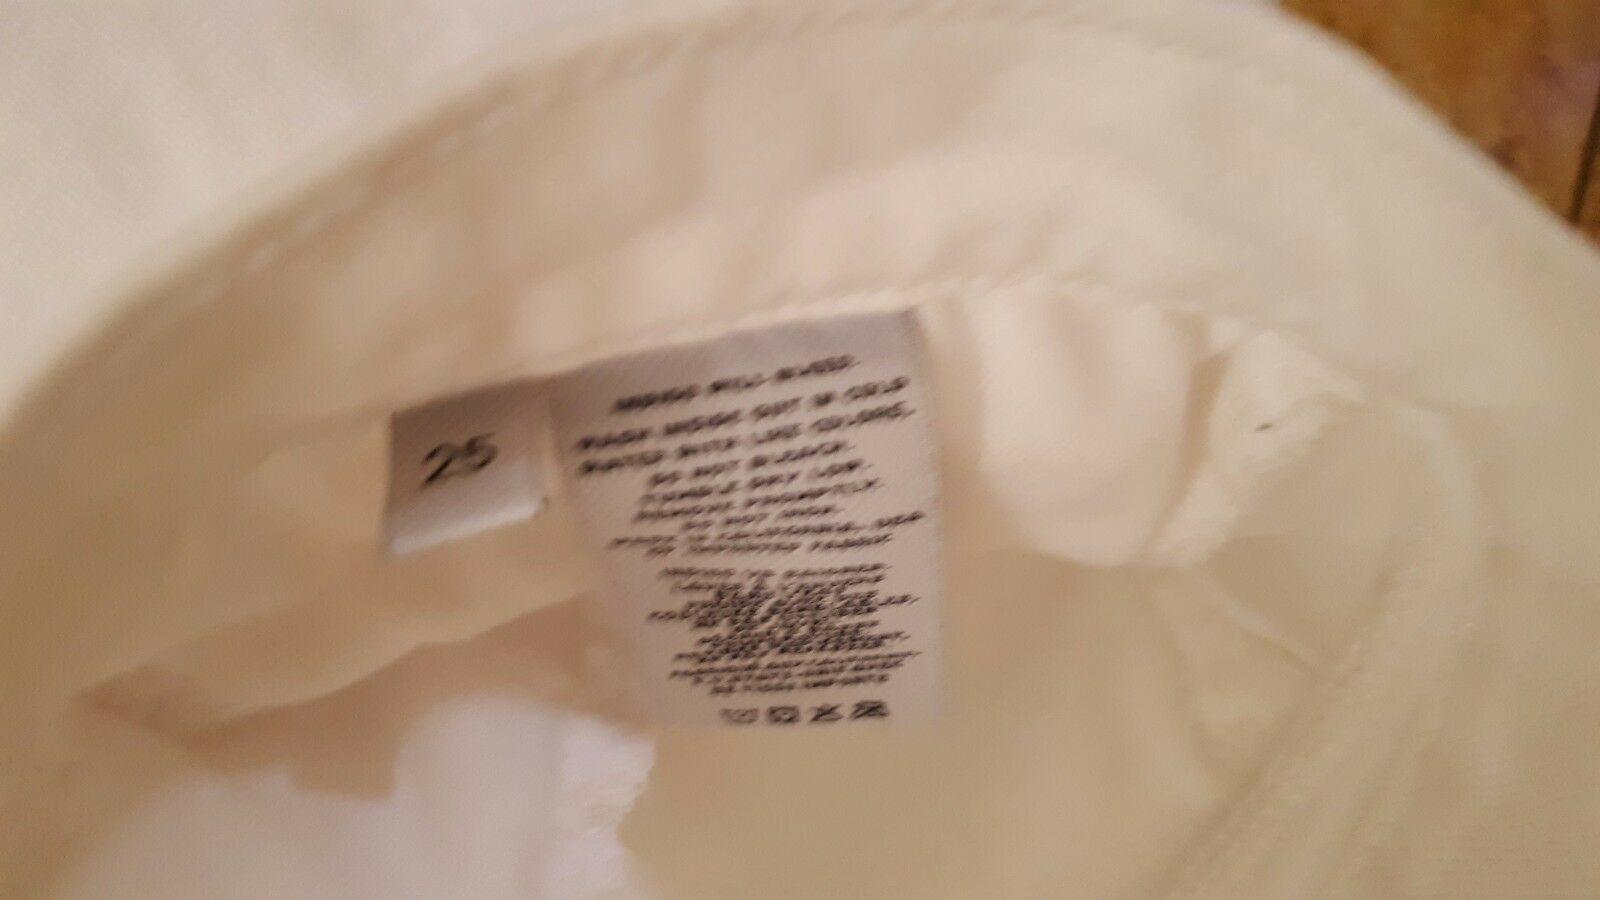 J Brand Jeans Women's Cropped  White Jeans sz 25 Denim  NICE!! #333 image 5